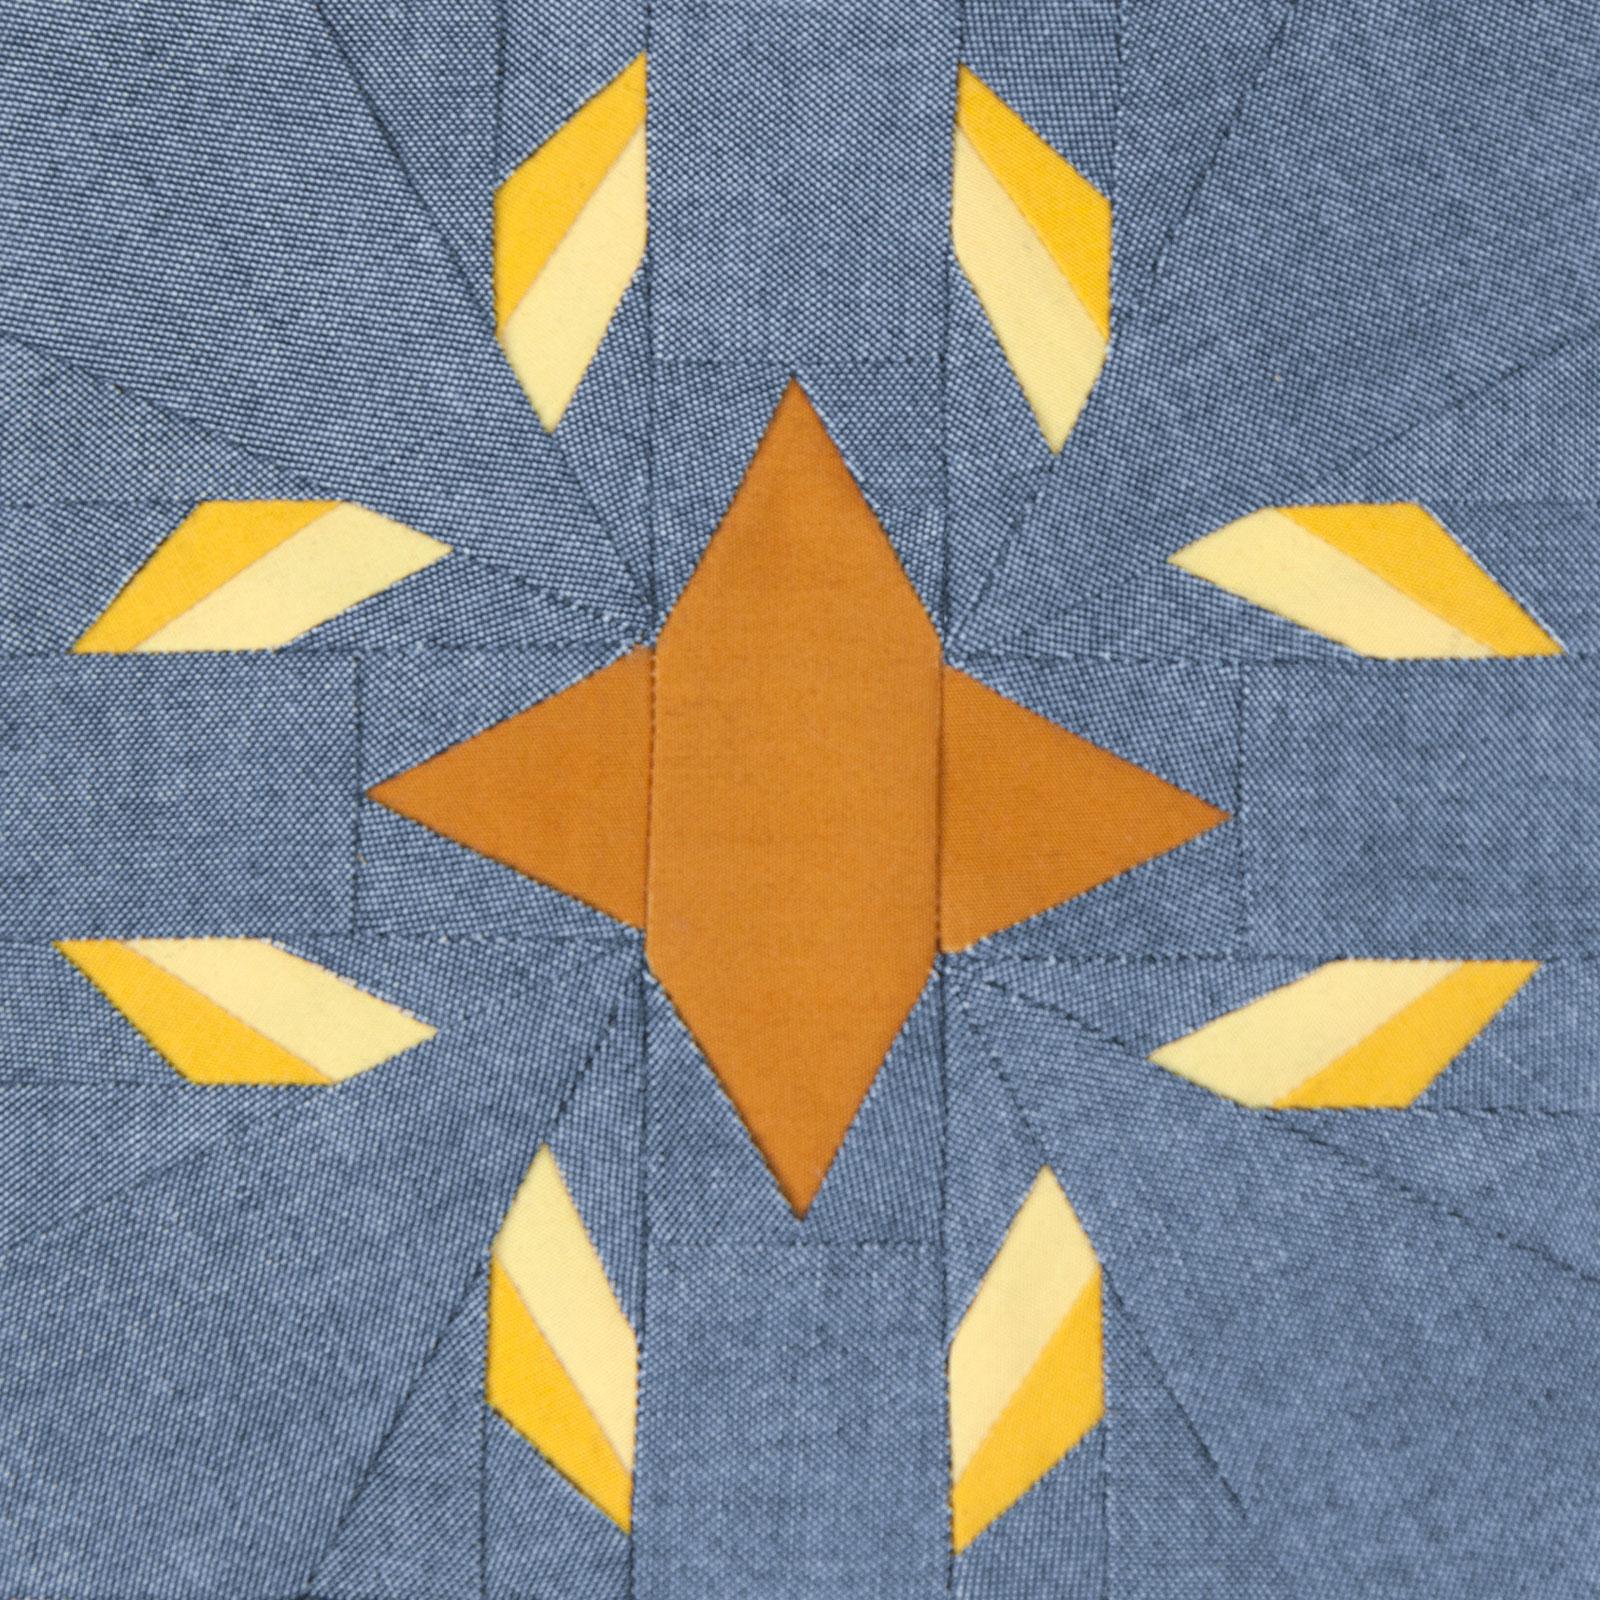 Lodestars quilt block #20: Yaa